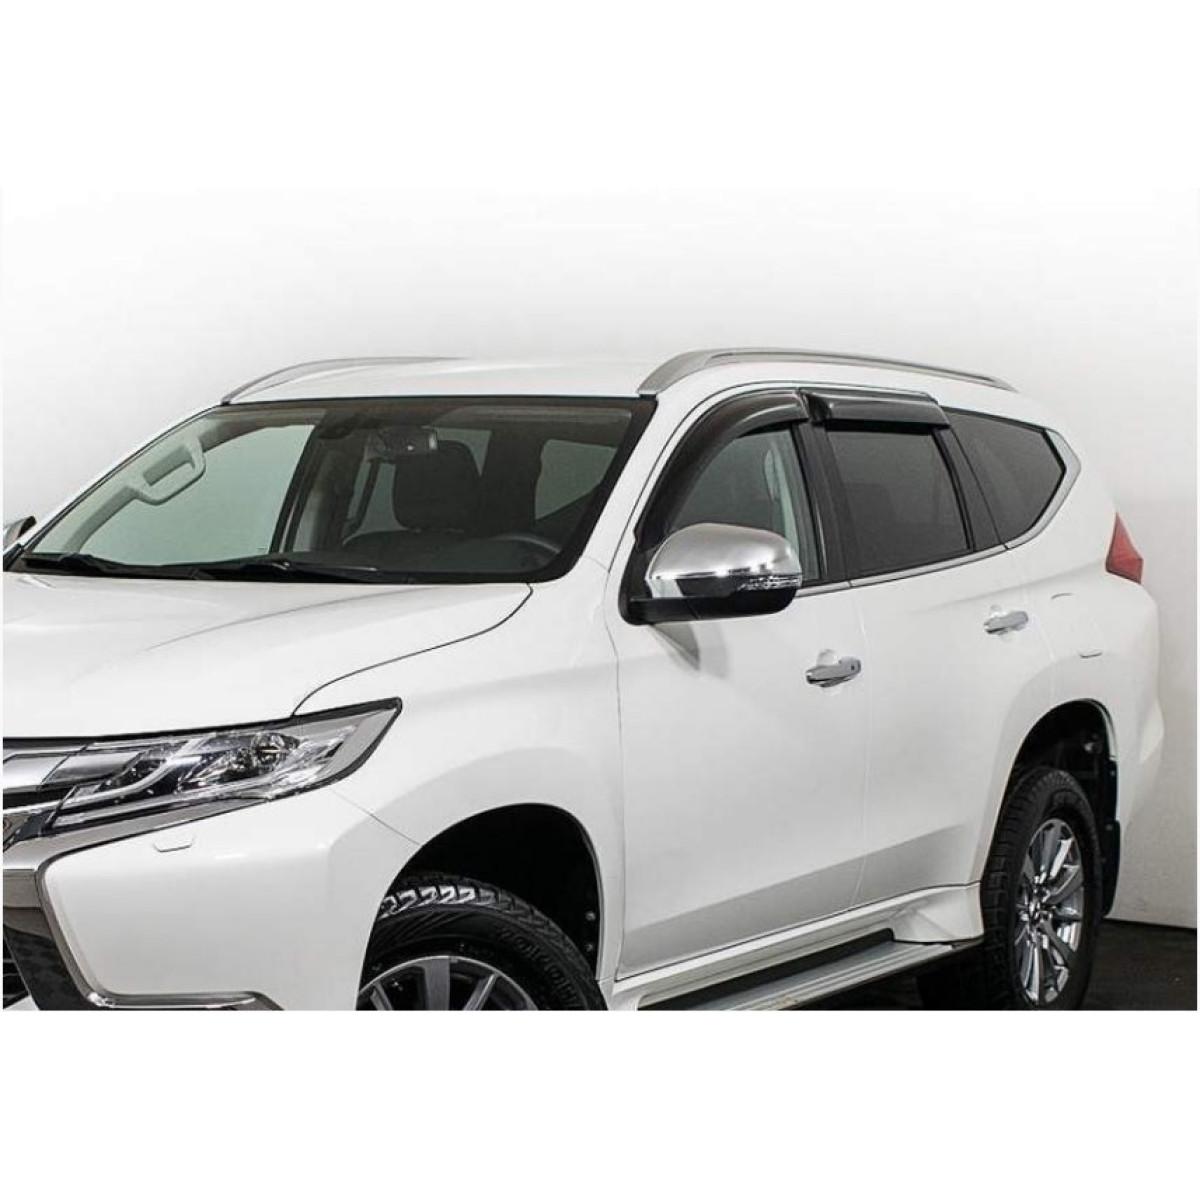 Дефлекторы окон Mitsubishi Pajero Sport 2018